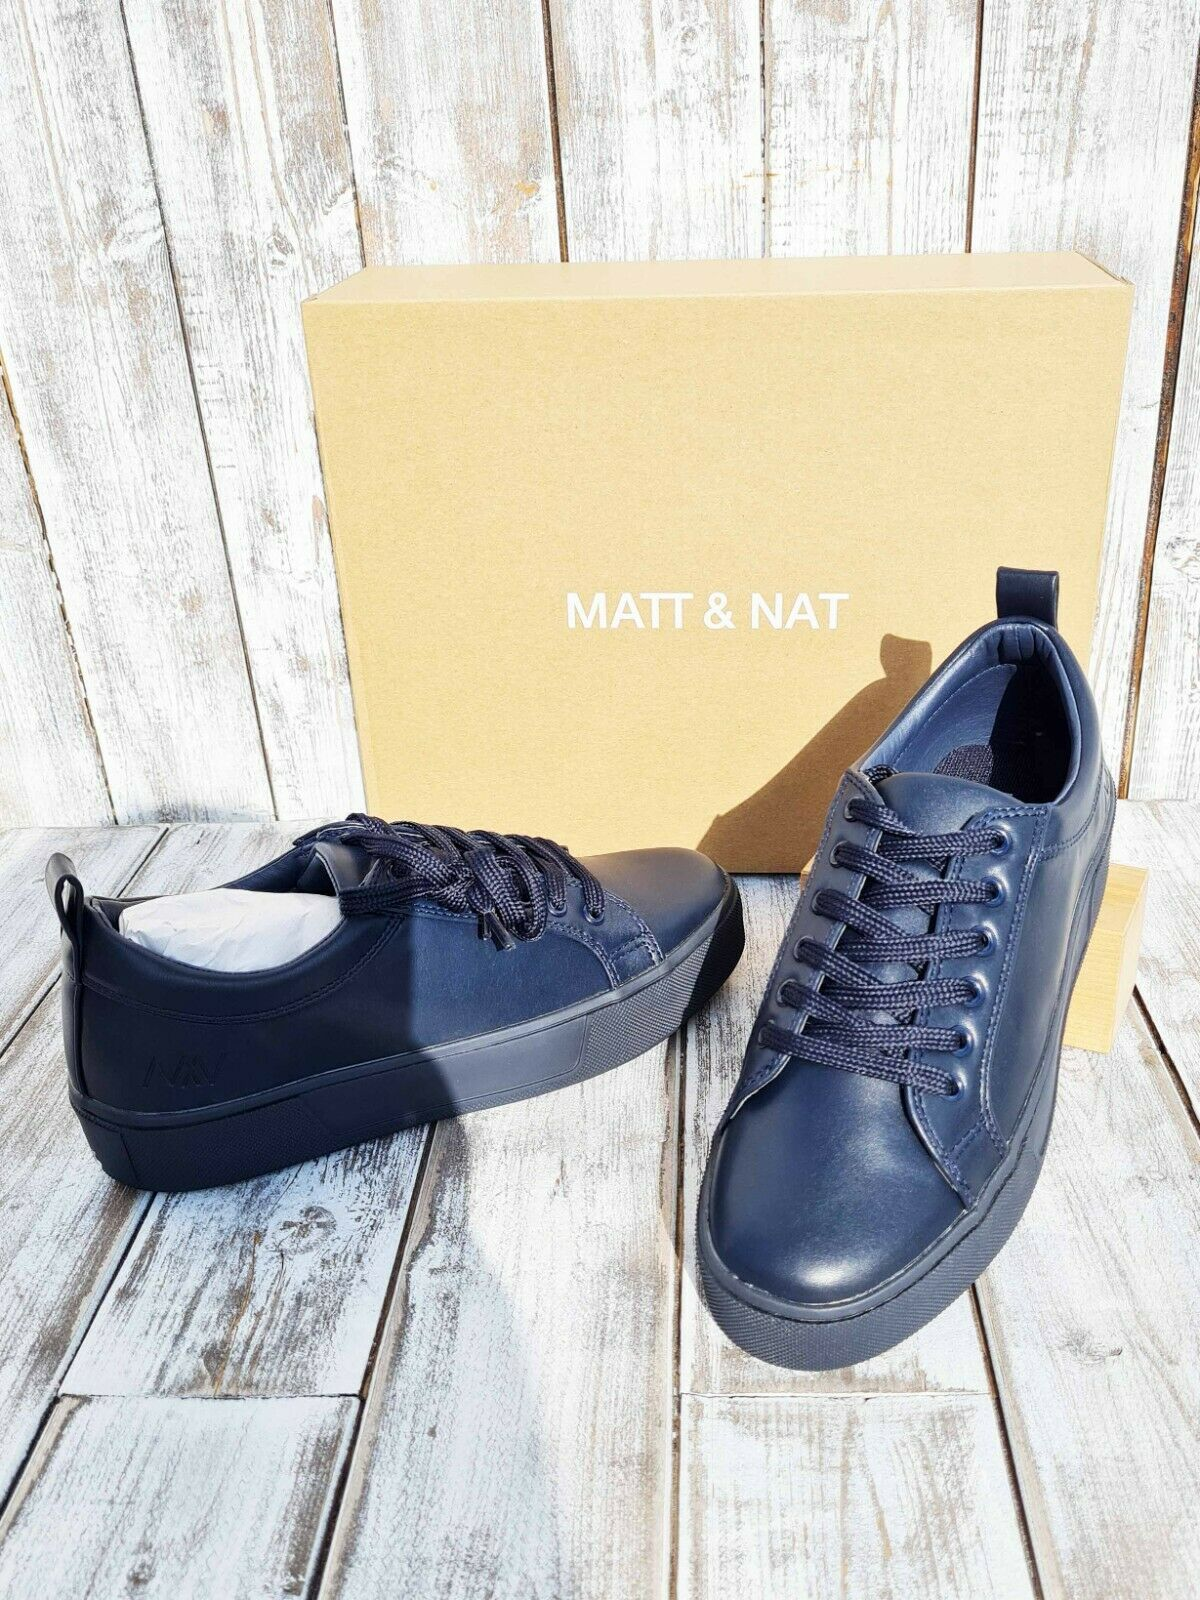 Anthropologie - MATT & NAT Vegan Bona Sneakers In Ink - UK: 5 / US: 7 / EU: 38